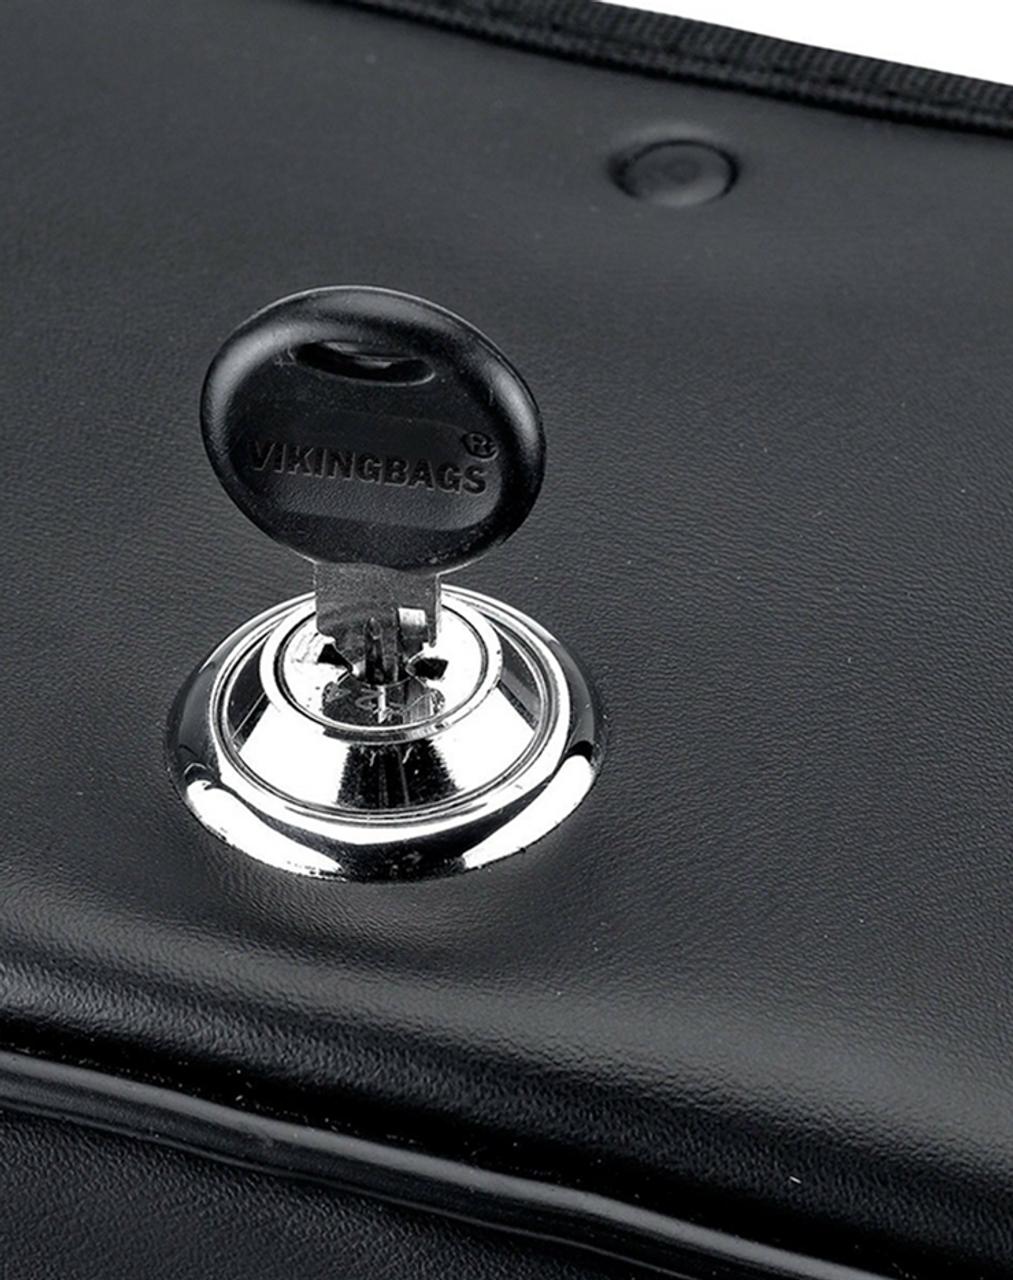 Suzuki Boulevard M50 VikingBags Overlord Large Side Pocket Saddlebags lock key view